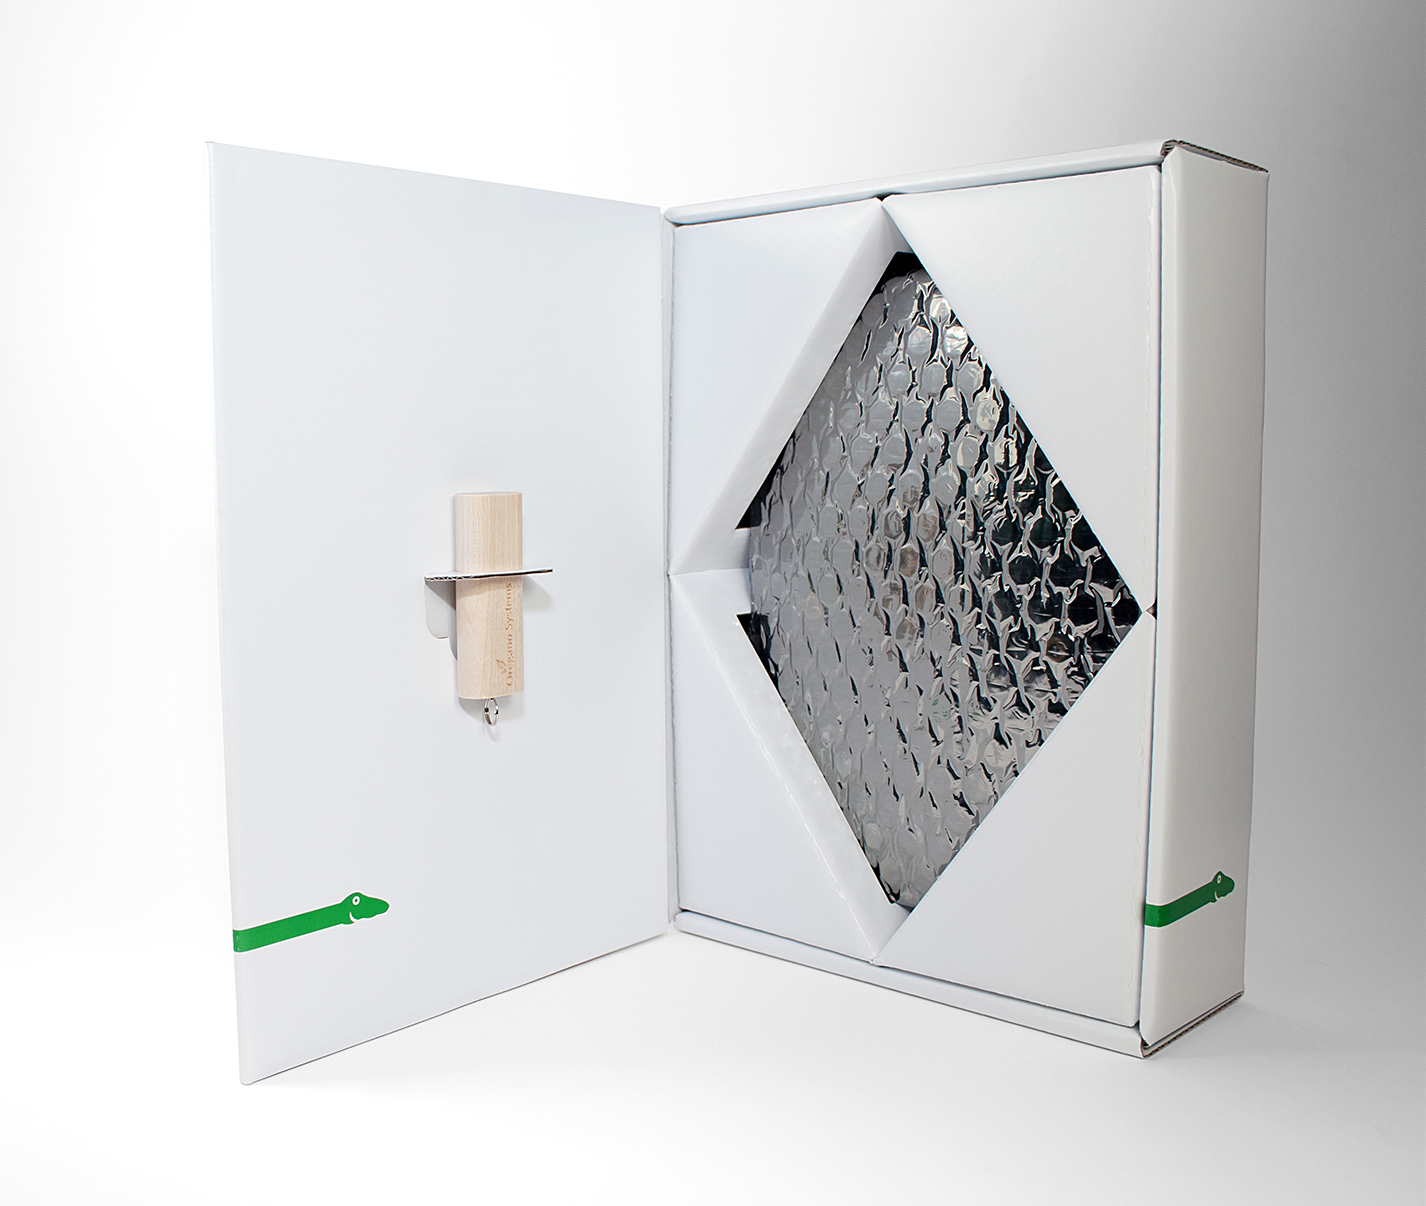 Oregano Systems Versandbox